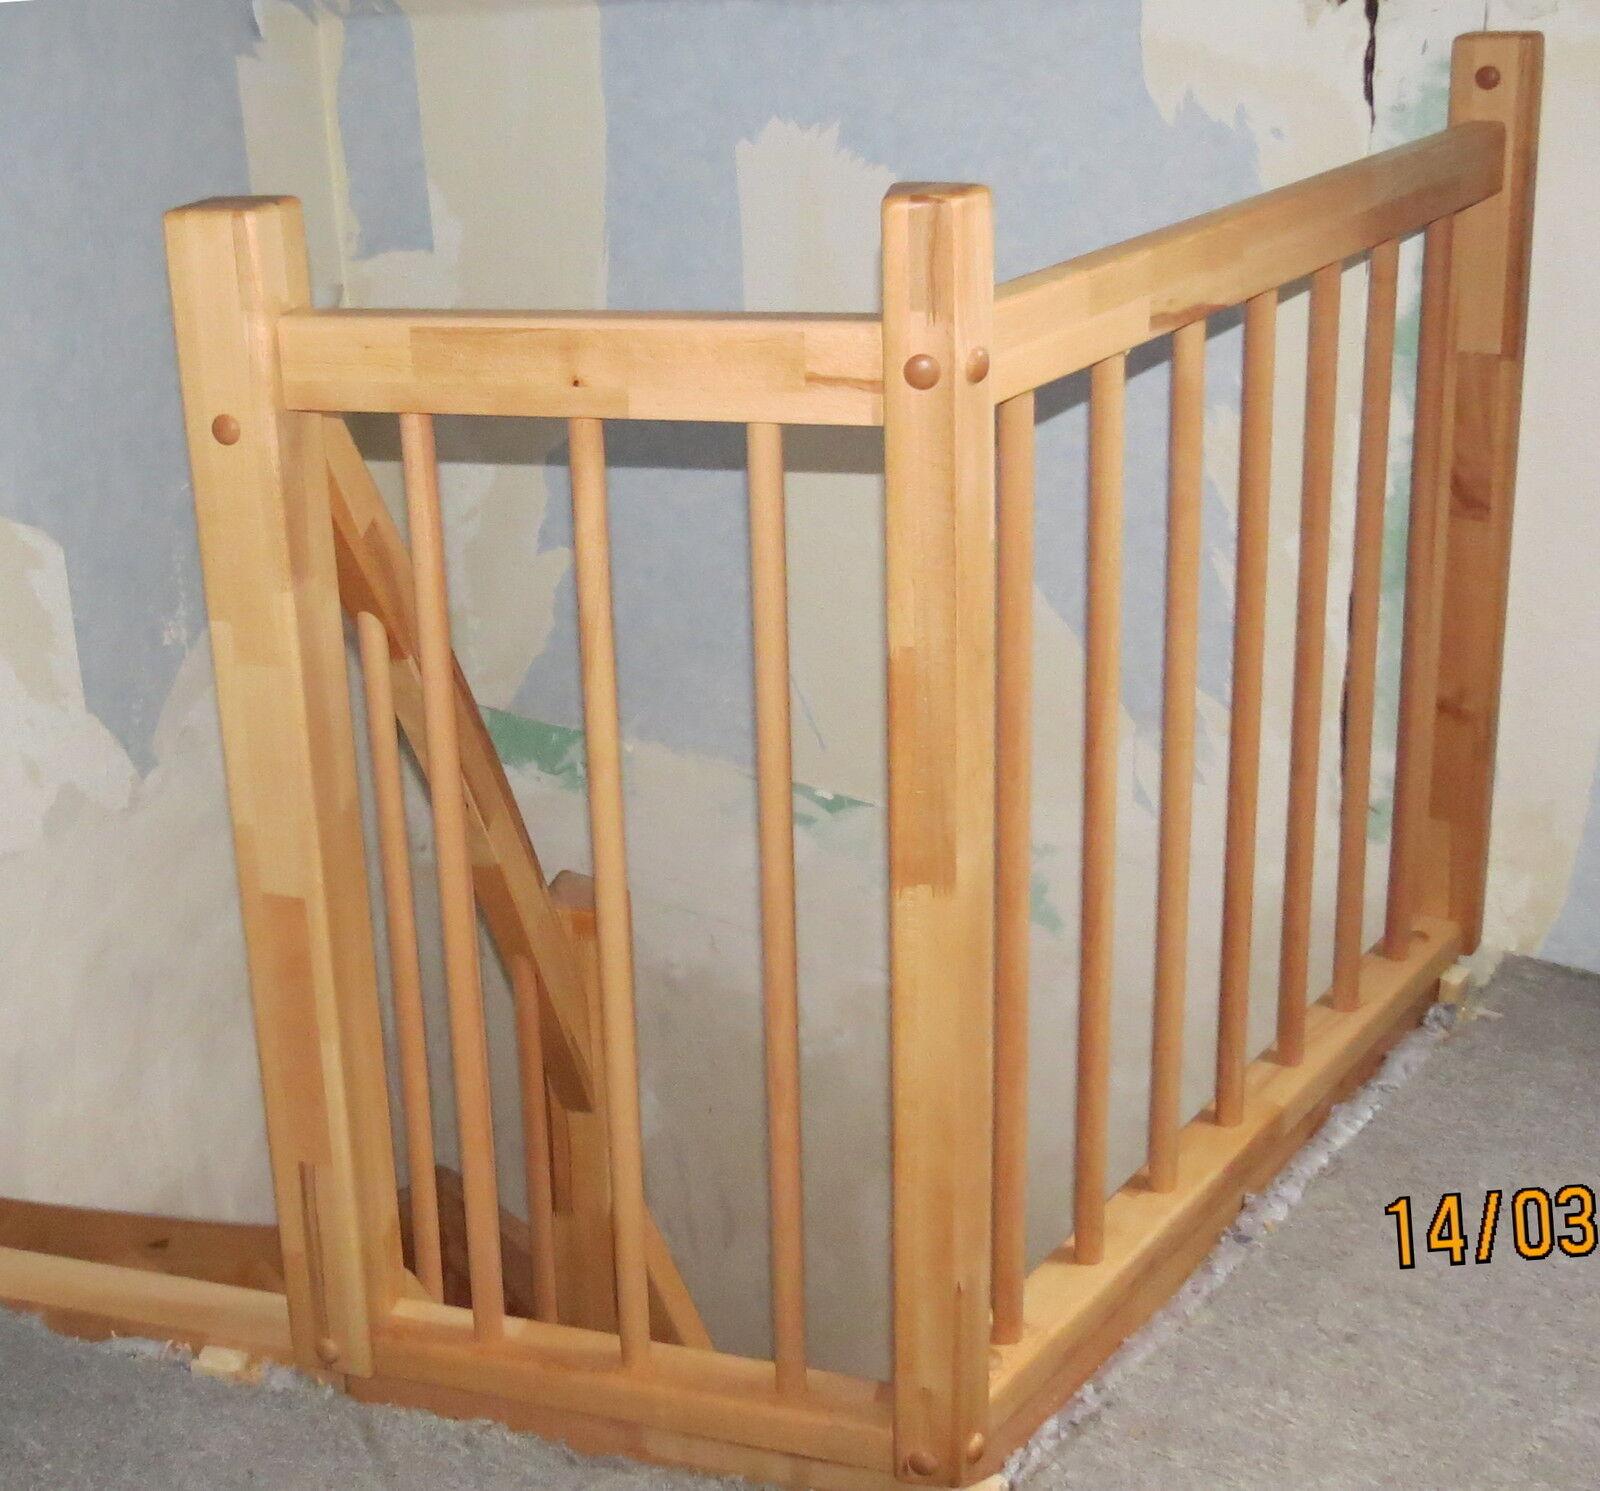 holzhandlauf innen gel nder holz massivholztrepe holztreppe wangentreppe buche eur 183 00. Black Bedroom Furniture Sets. Home Design Ideas